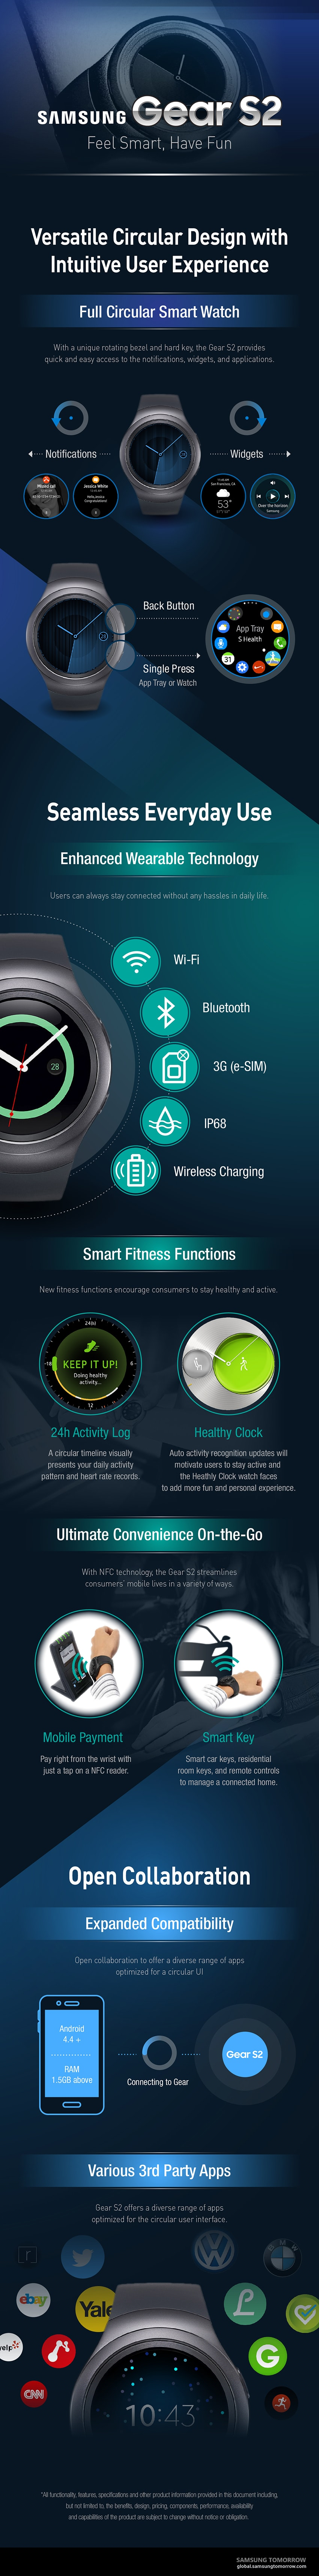 samsung gear s2 - 4 - infografia